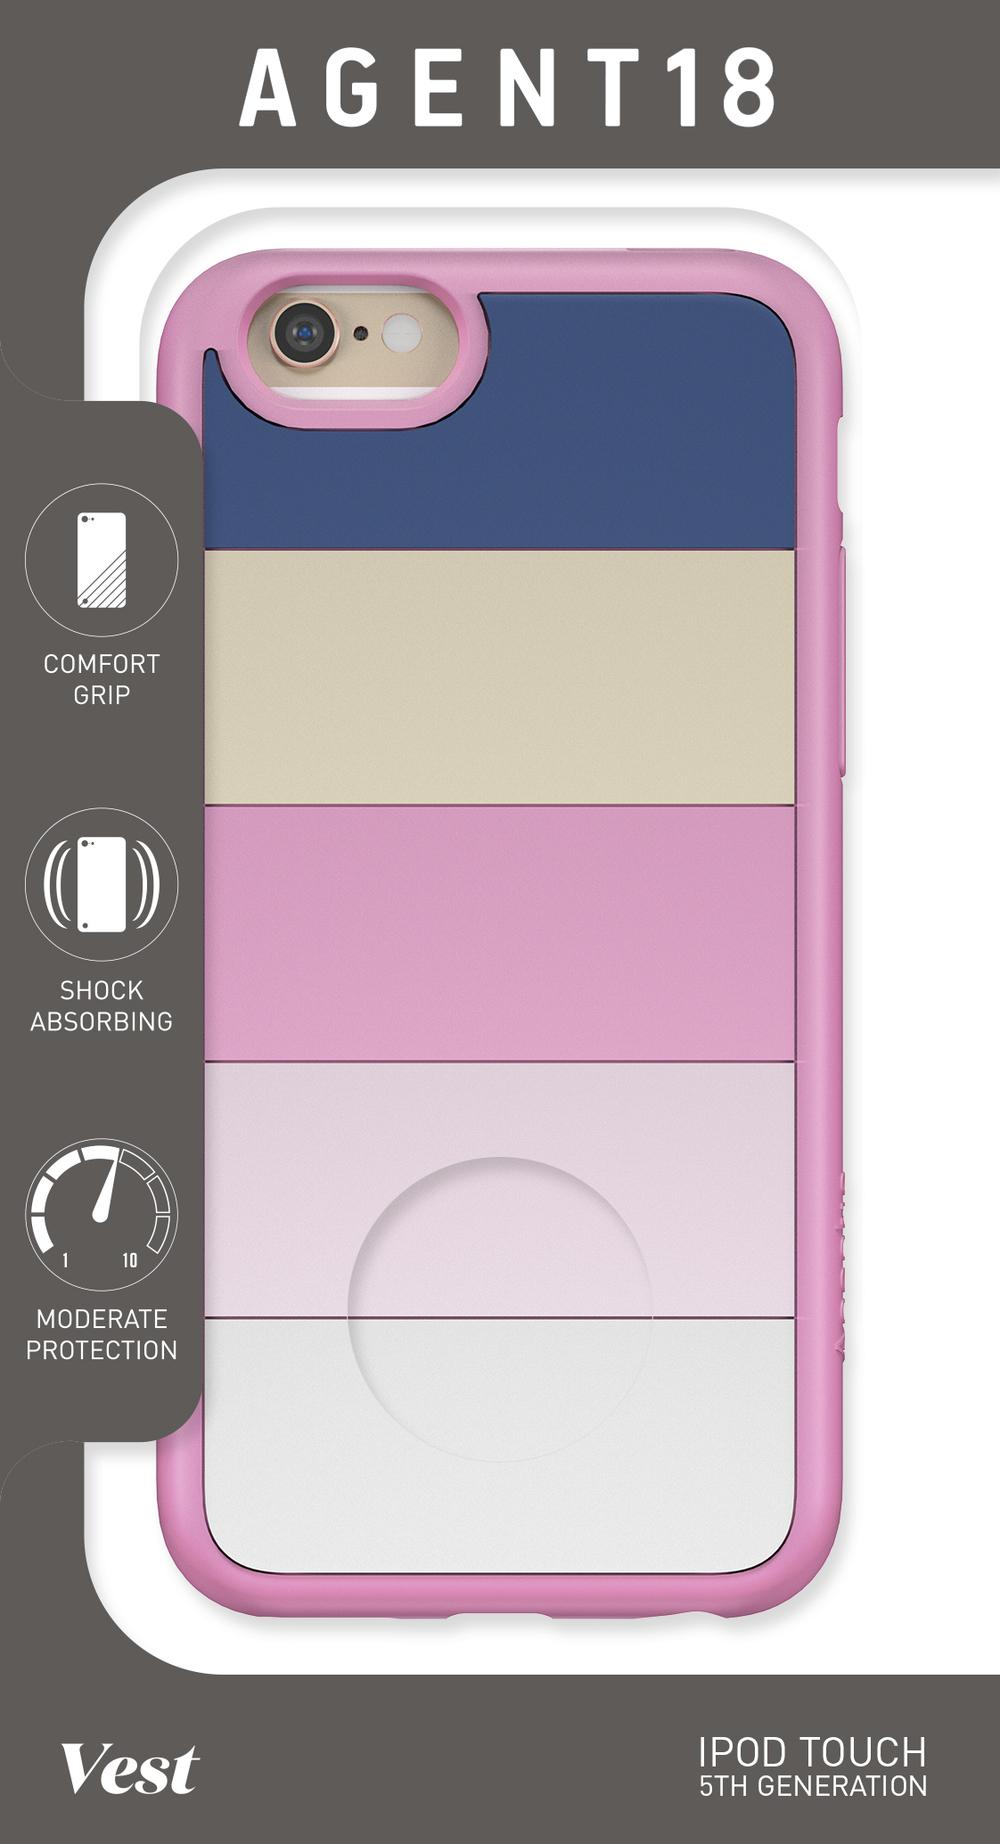 iPodTouch5-Packaging-Rendering-Vest-Colorblock.jpg